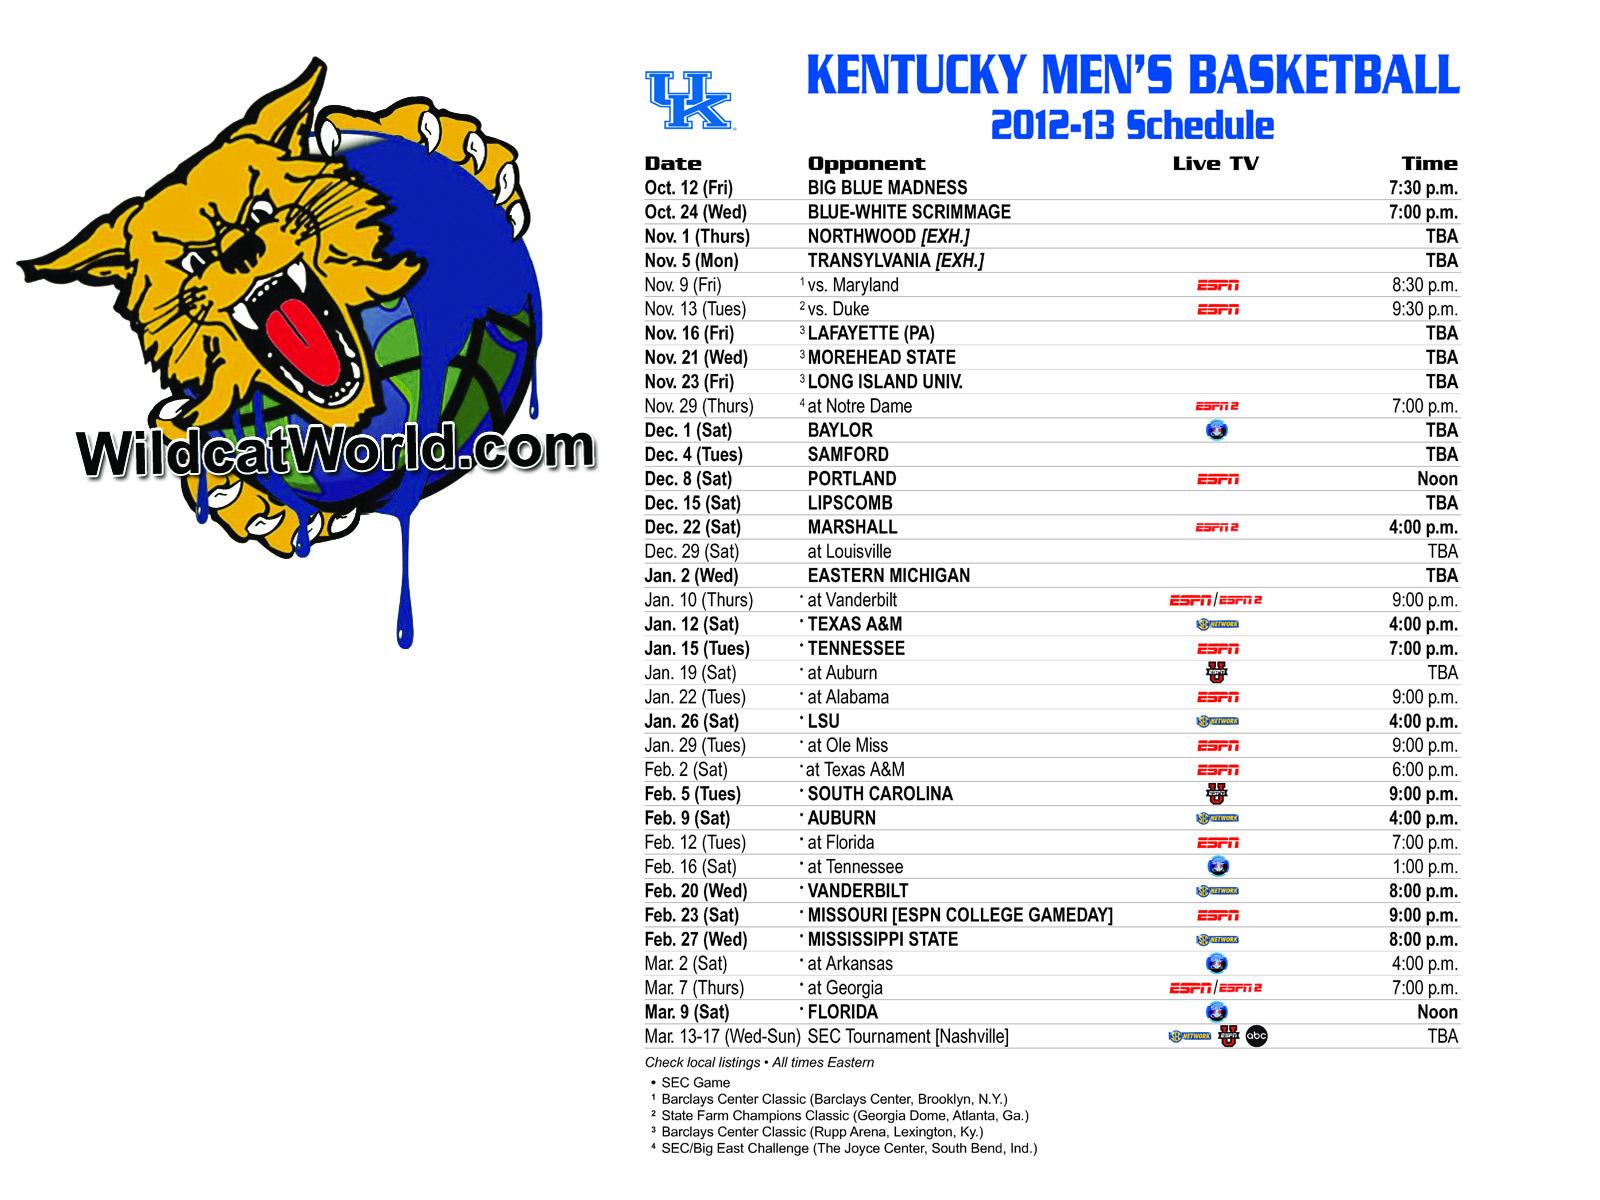 photo relating to Printable Uk Basketball Schedule referred to as 49+] Kentucky Basketball Wallpaper 2015 upon WallpaperSafari